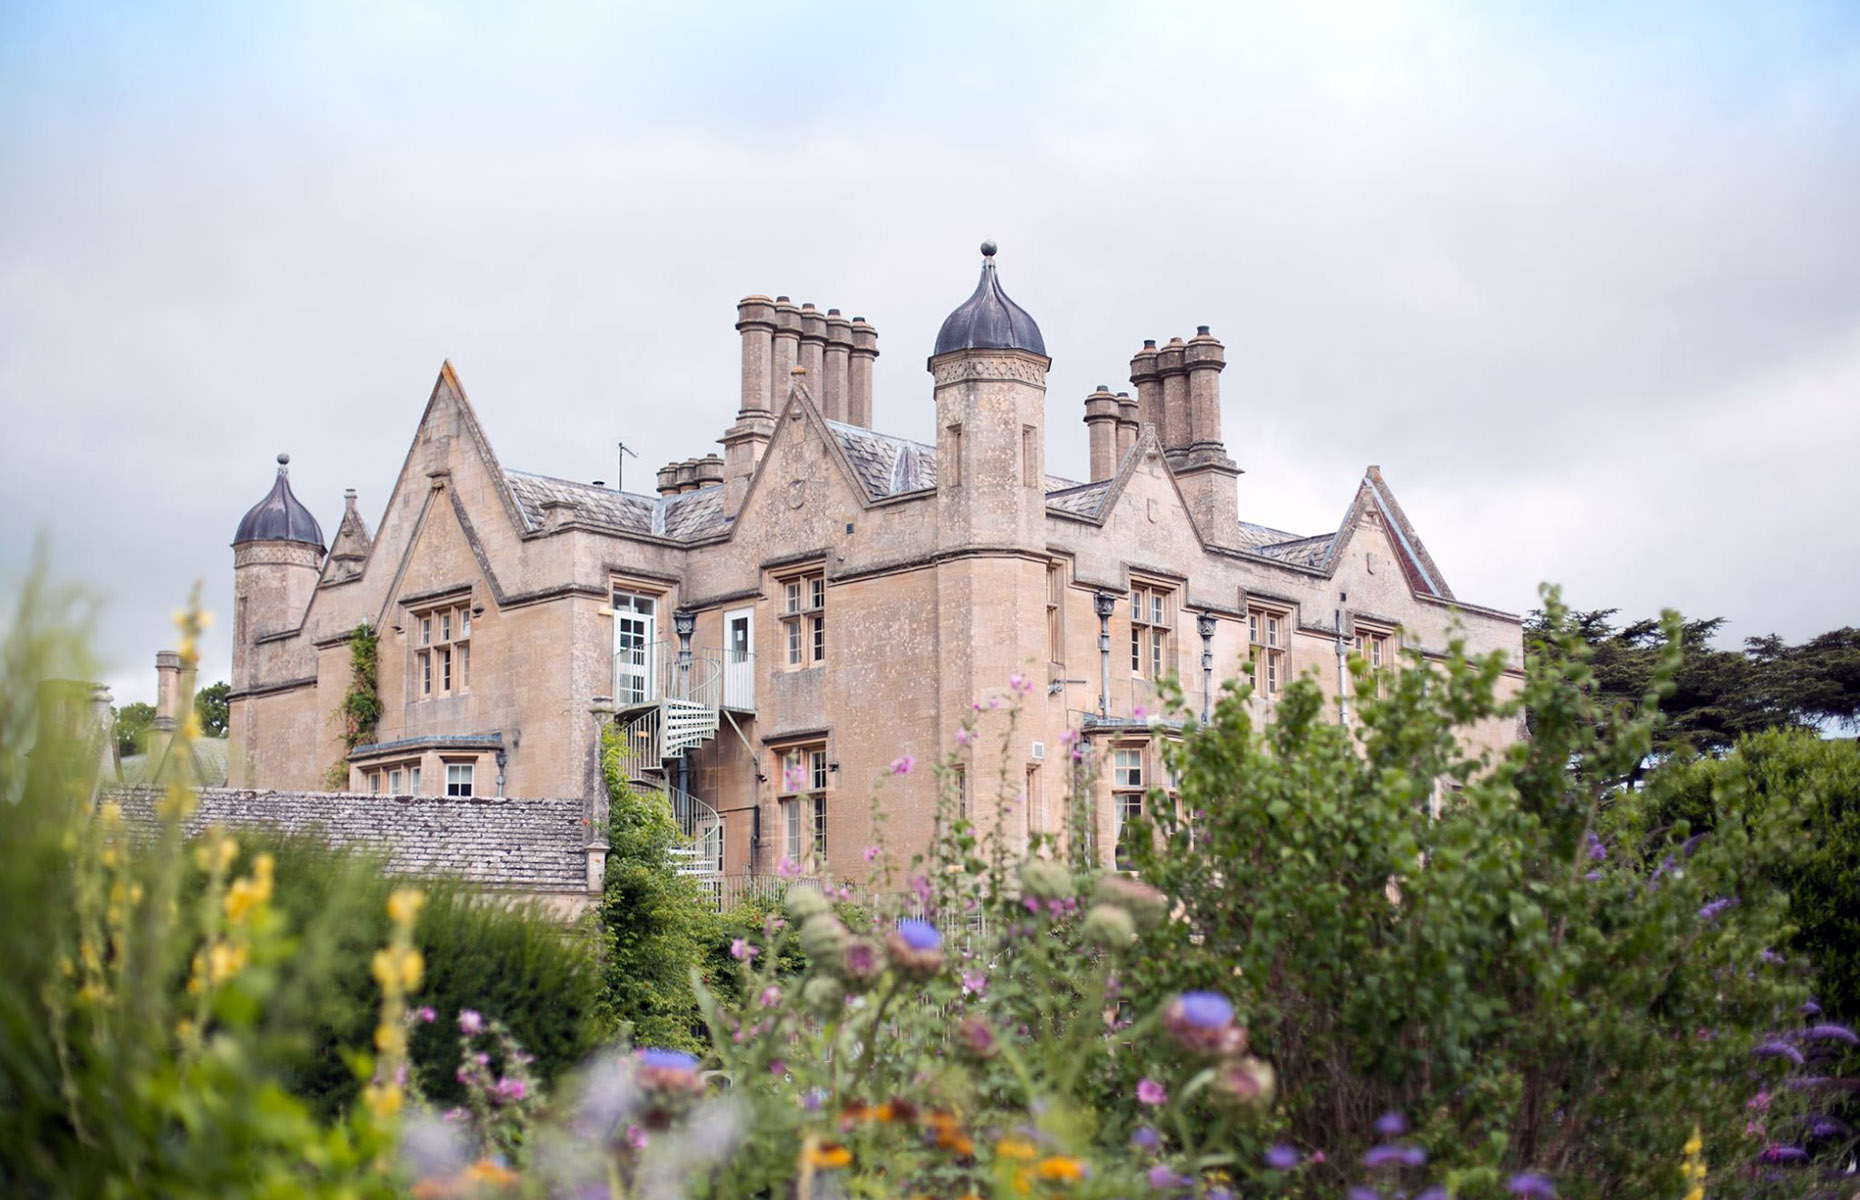 Dumbleton Hall Hotel in the Cotswolds, UK (Image: DumbletonHallHotel/Facebook)